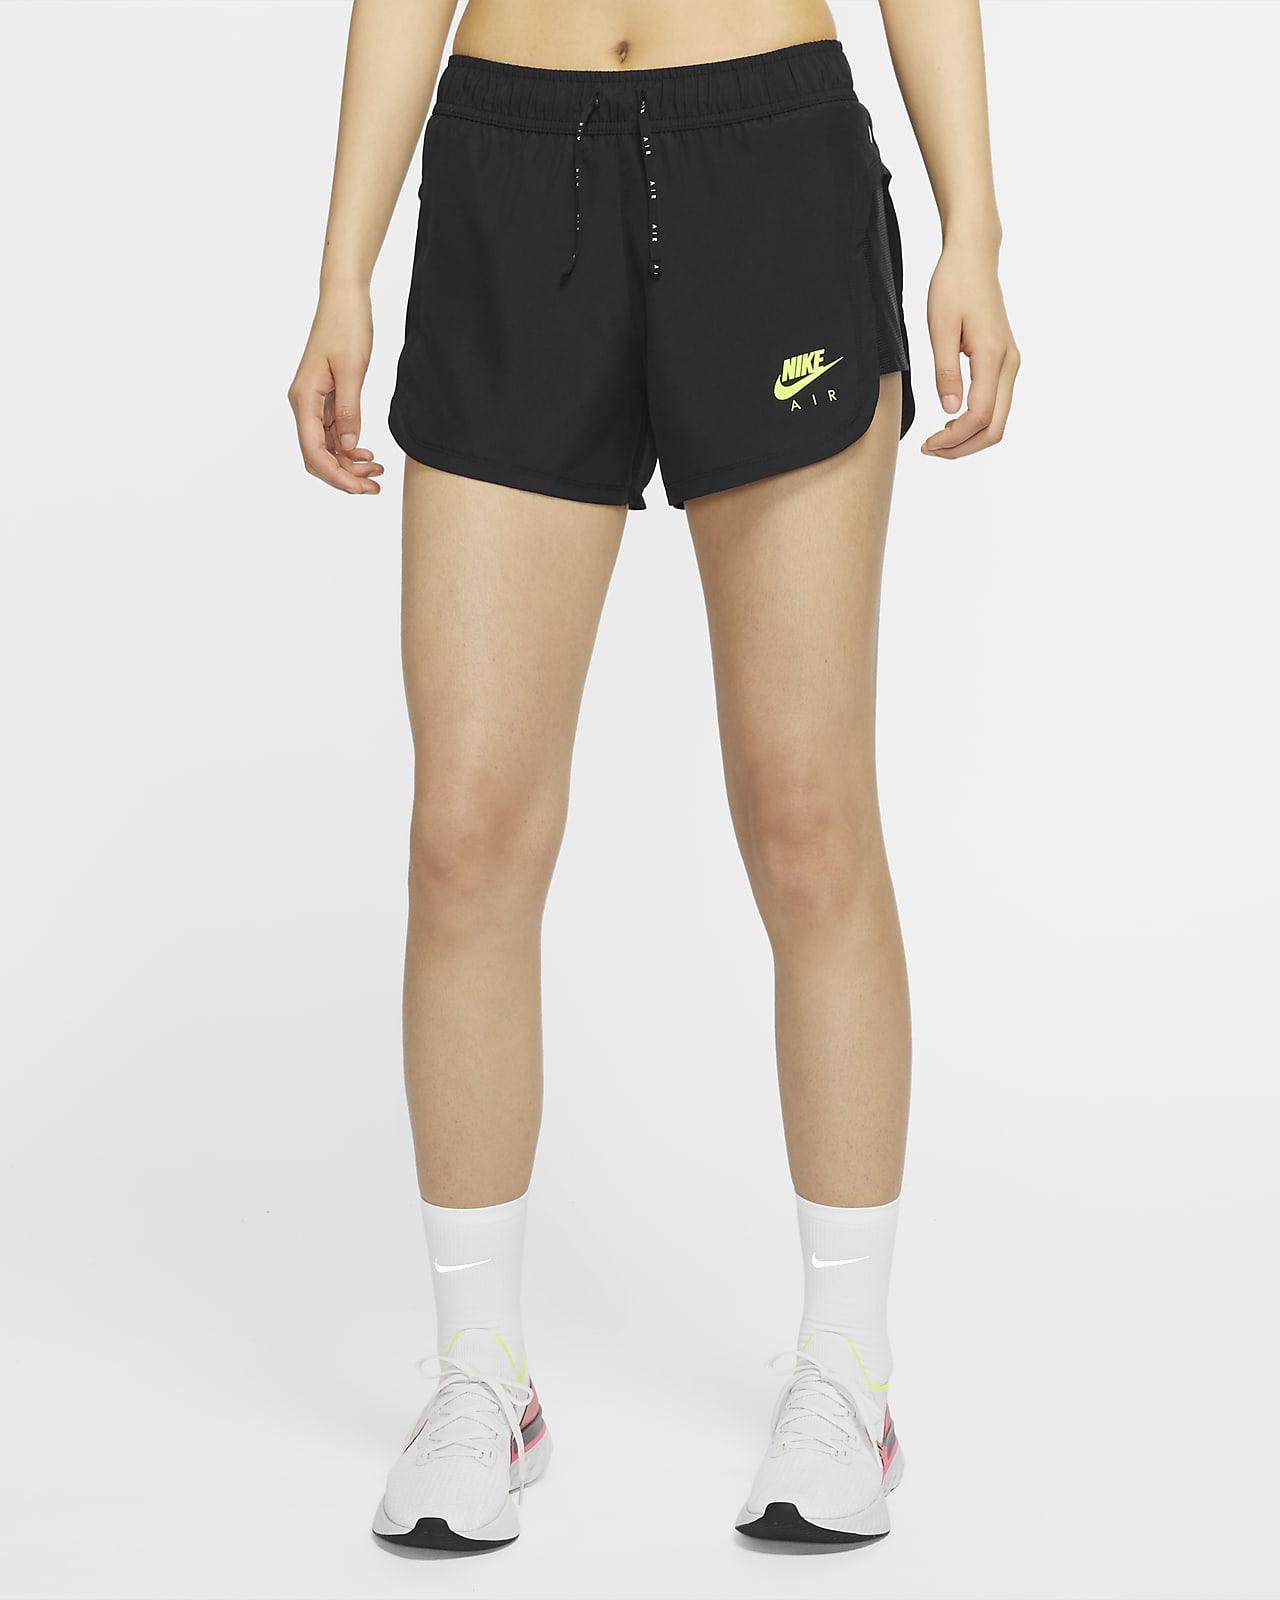 Nike Air Women's Running Shorts. Nike ID